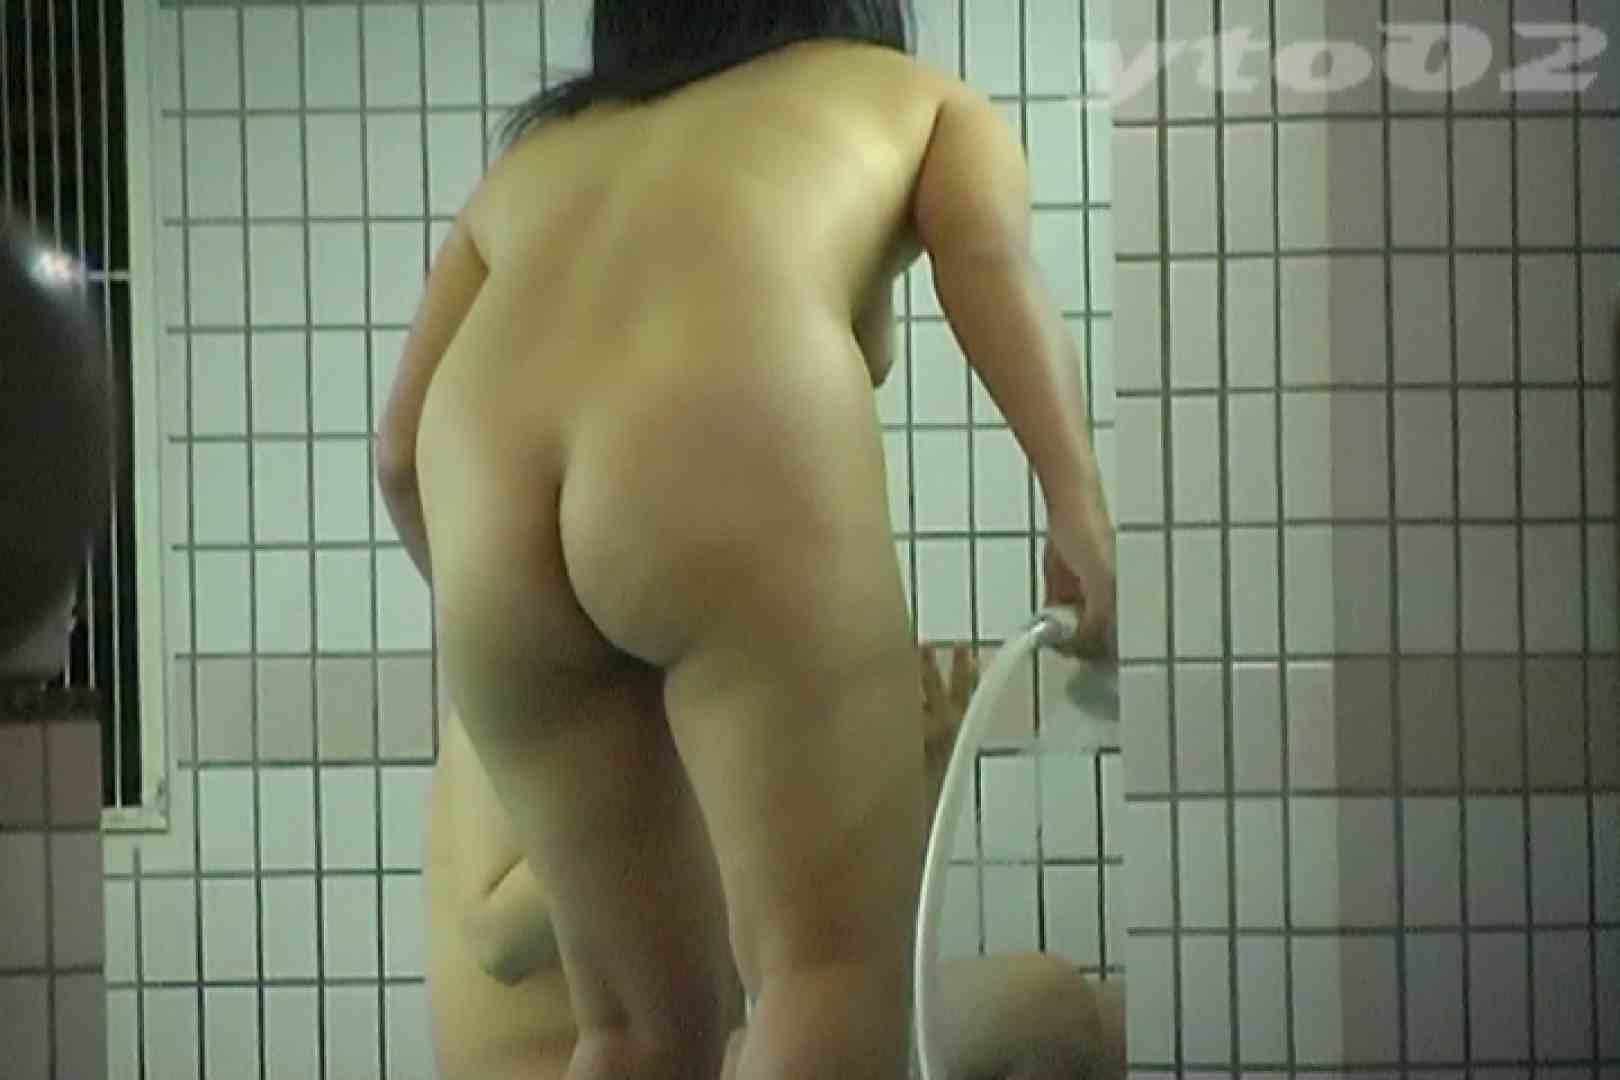 【期間限定配信】合宿ホテル女風呂盗撮 Vol.15 期間限定 エロ画像 62PIX 44